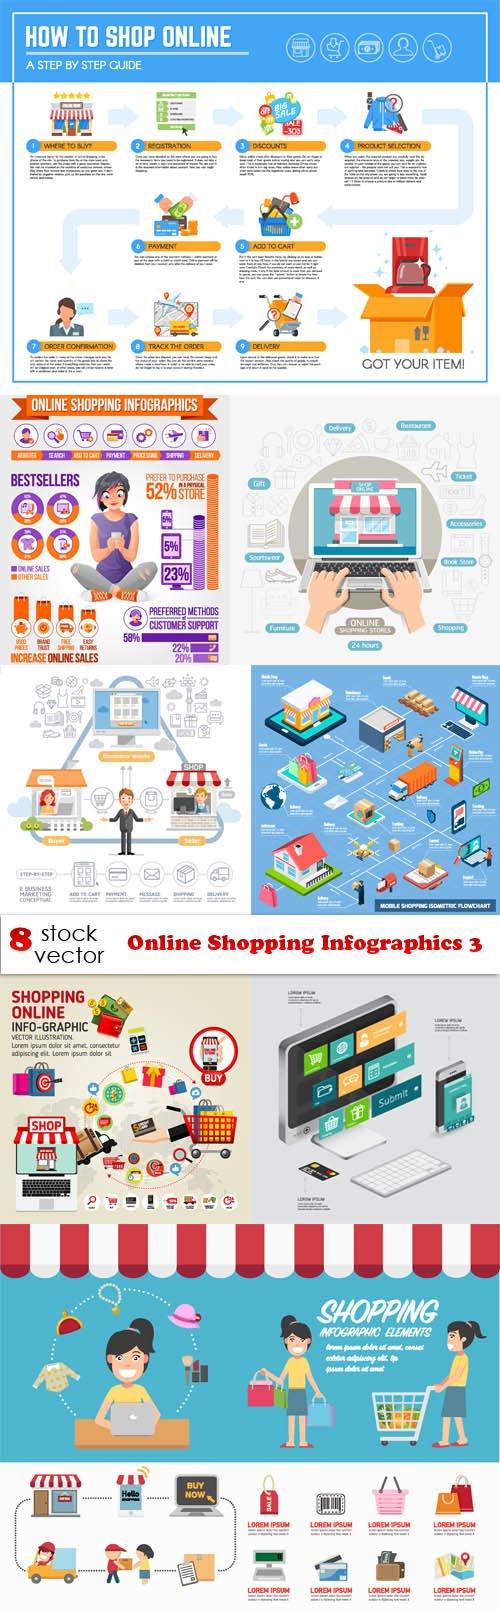 Vectors - Online Shopping Infographics 3